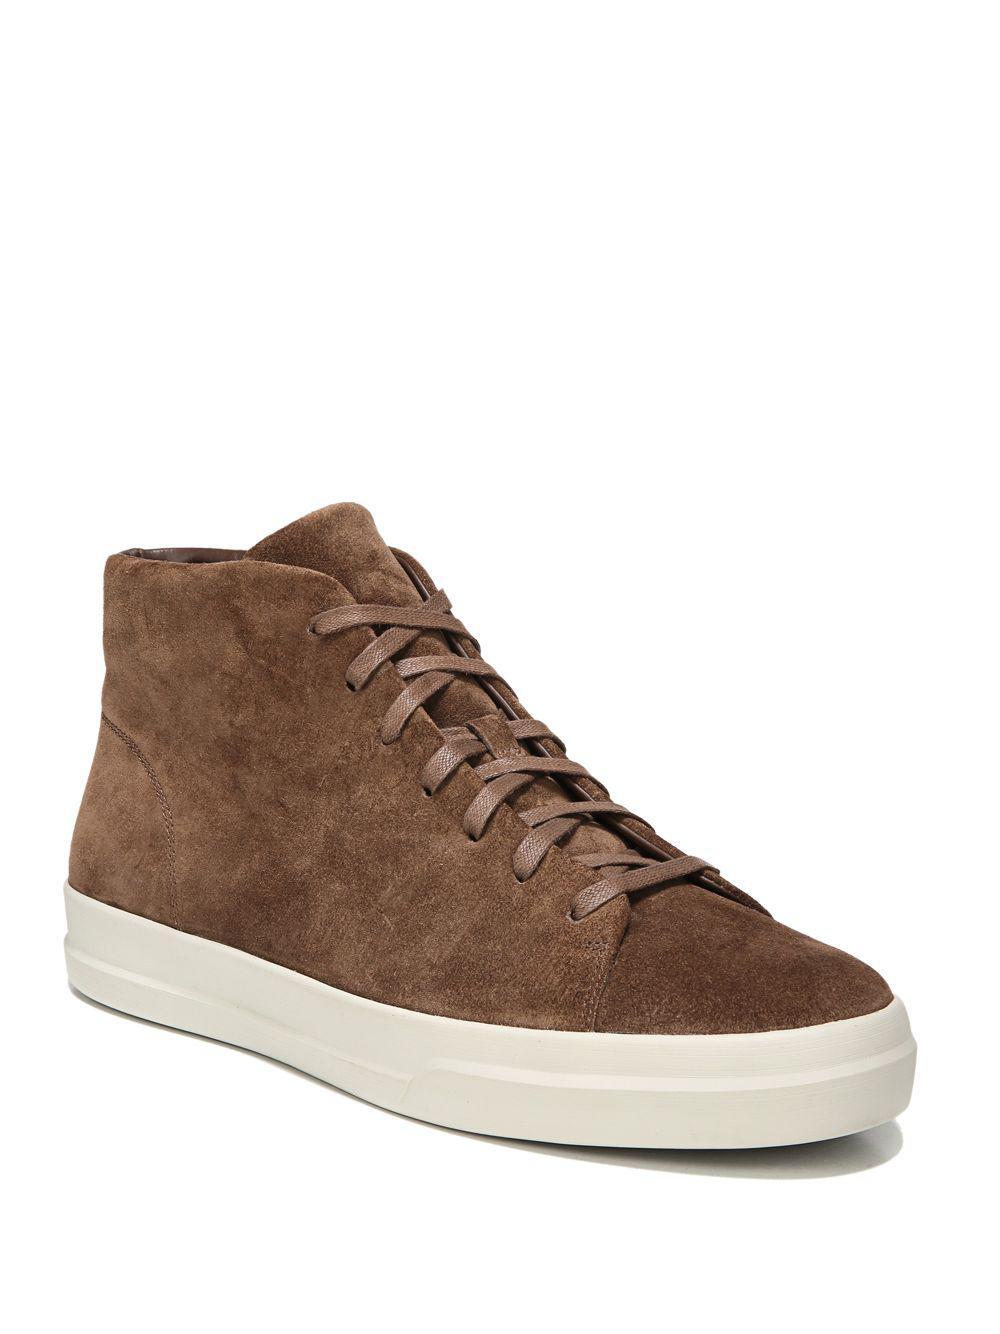 Vince Cullen Sport Suede High-Top Sneakers GhgukH